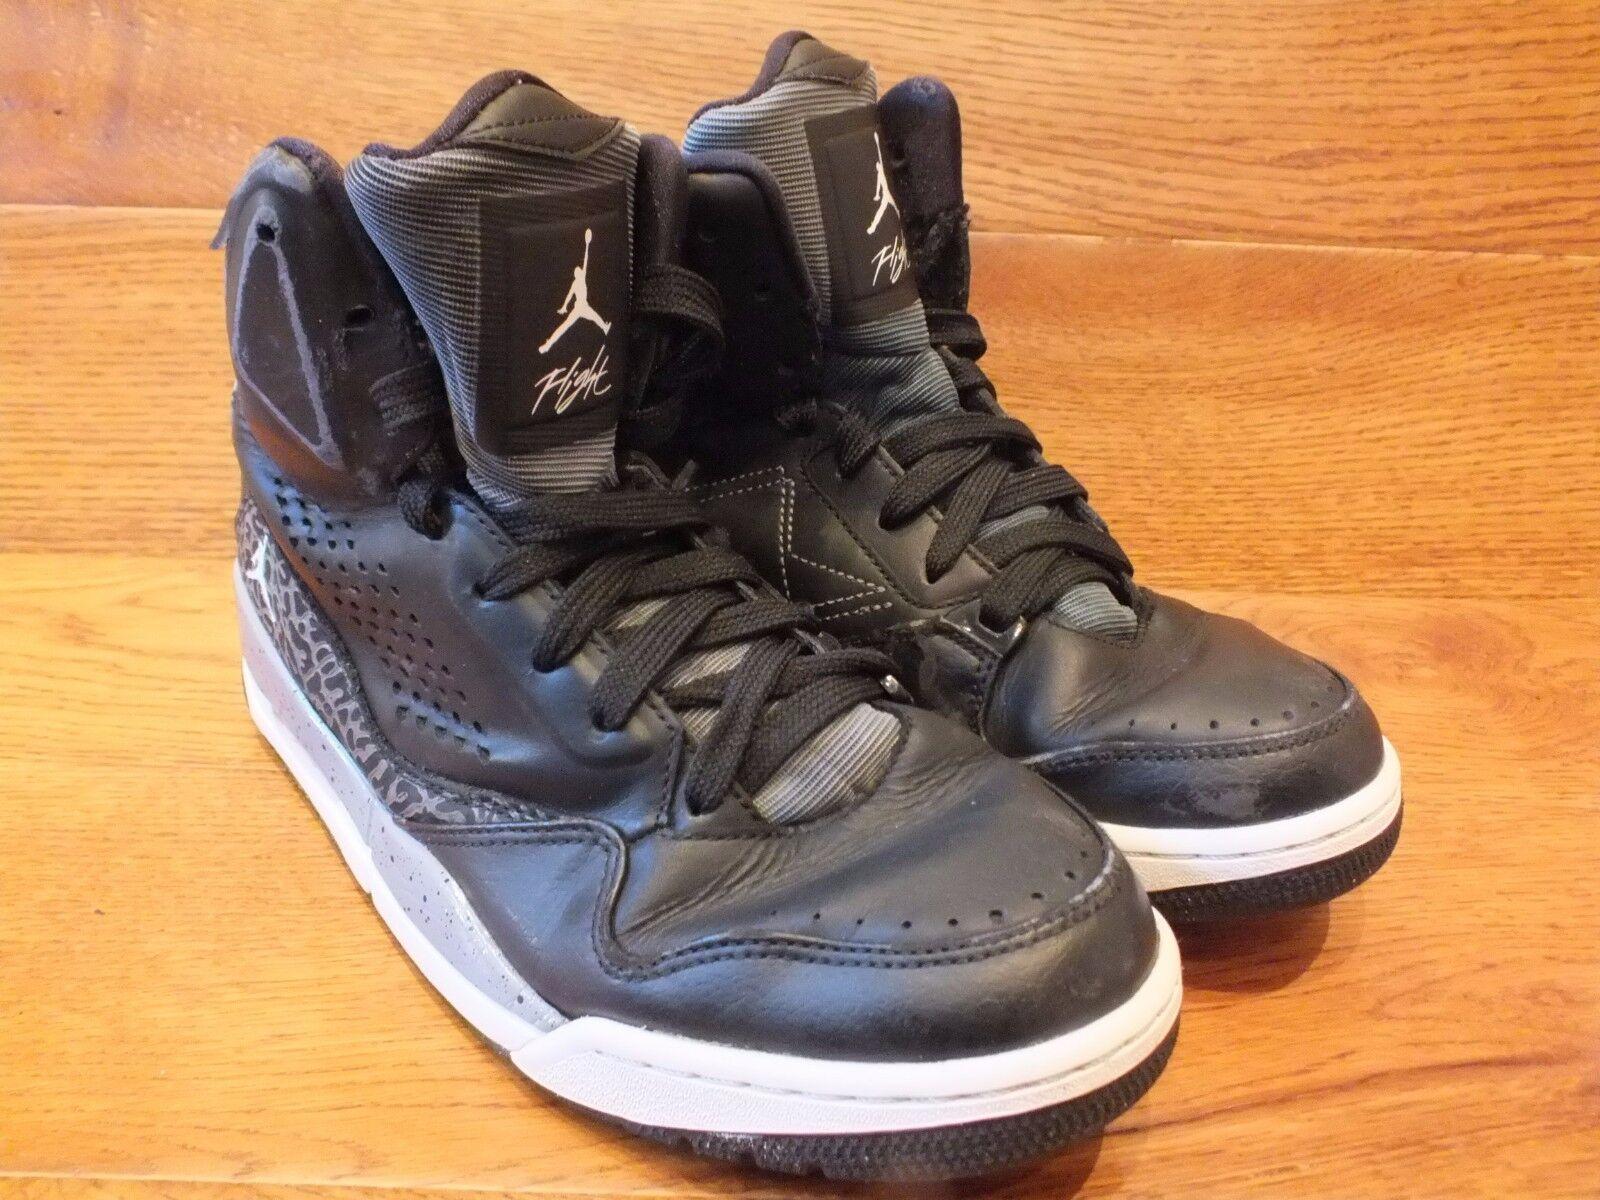 Nike Air Jordan SC 3 Flight Noir Mi Haut Baskets UK 6 EU 40